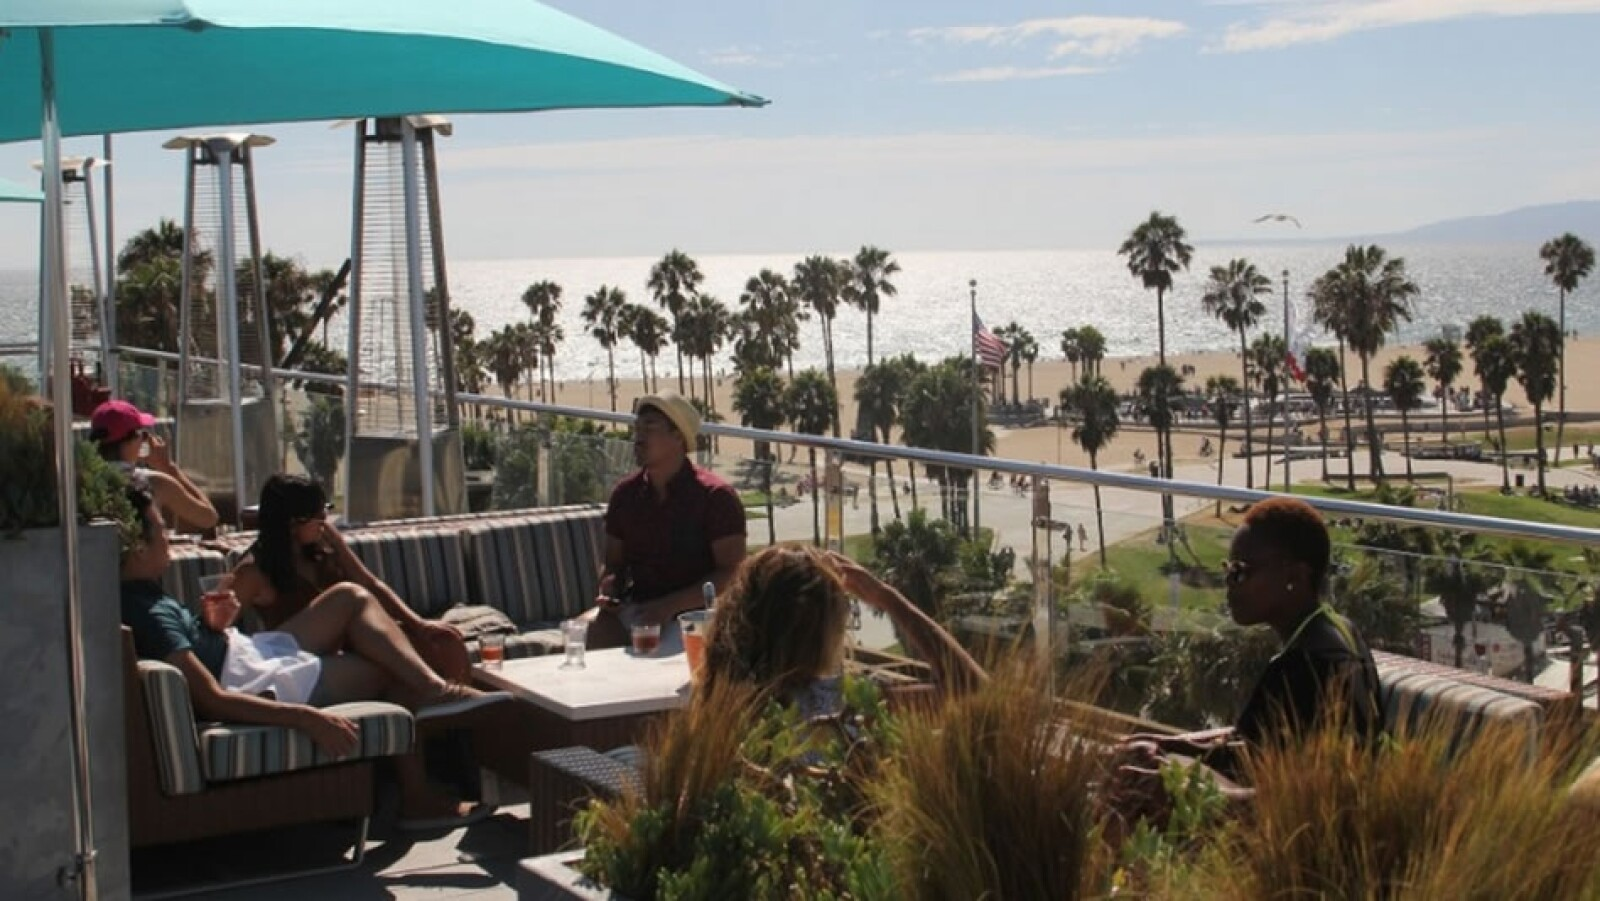 High Rooftop Lounge, Hotel Erwin (Los Ángeles)